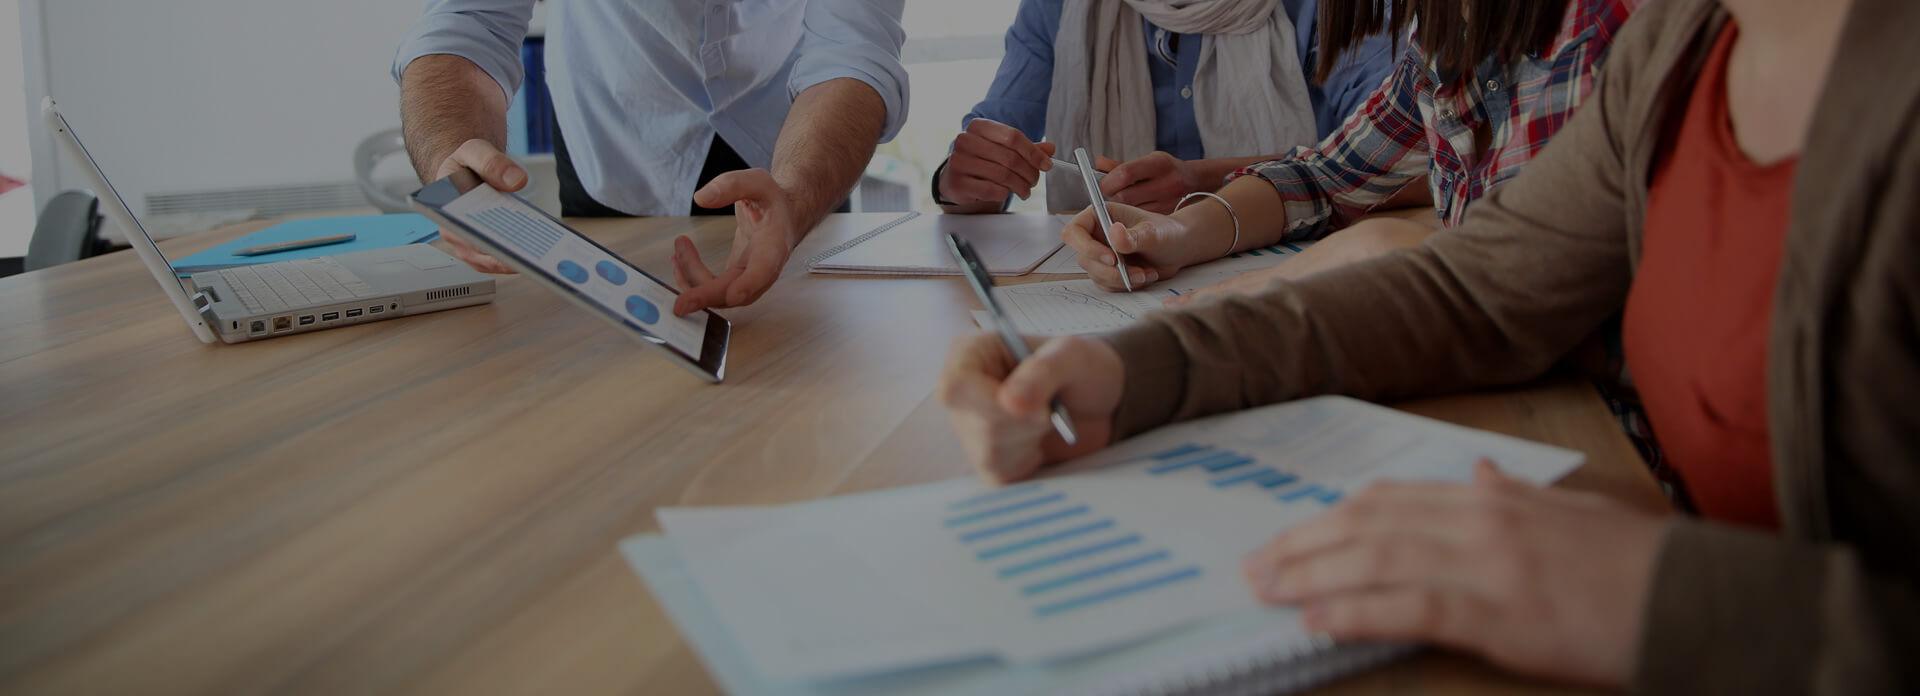 automated-employee-training-learning-management-system.jpg